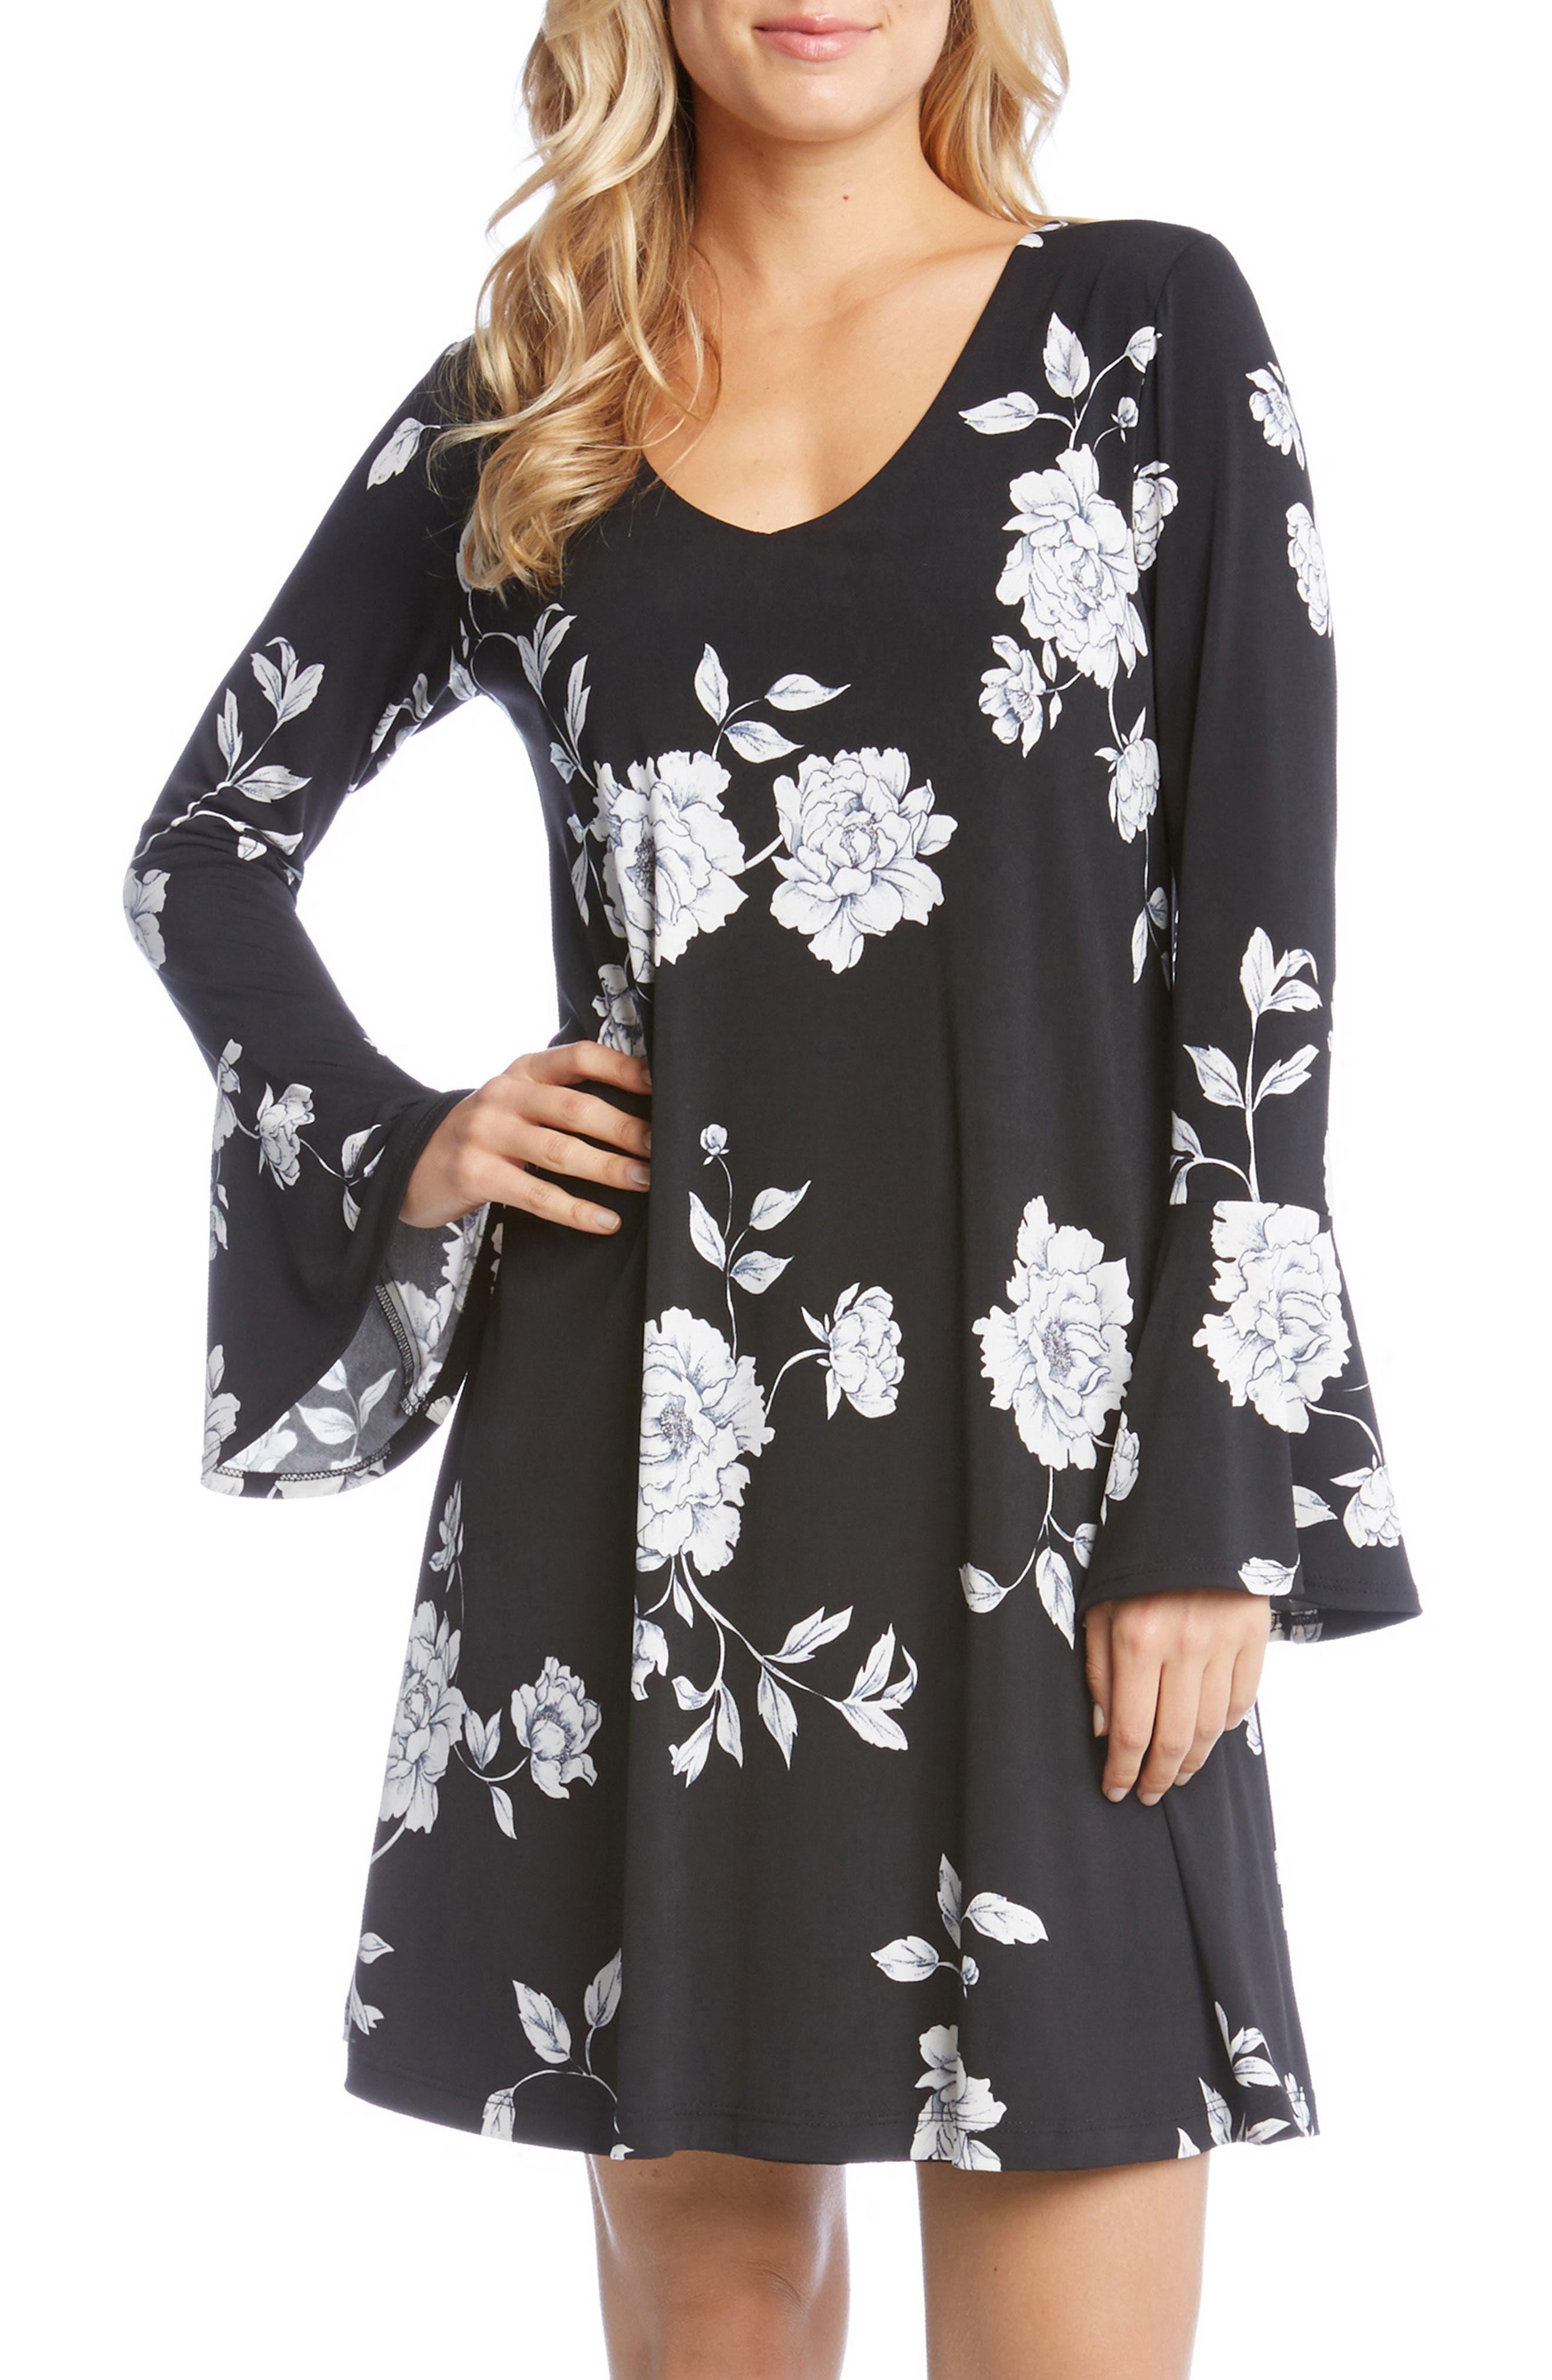 Main Image - Karen Kane Taylor Bell Cuff Floral A-Line Dress